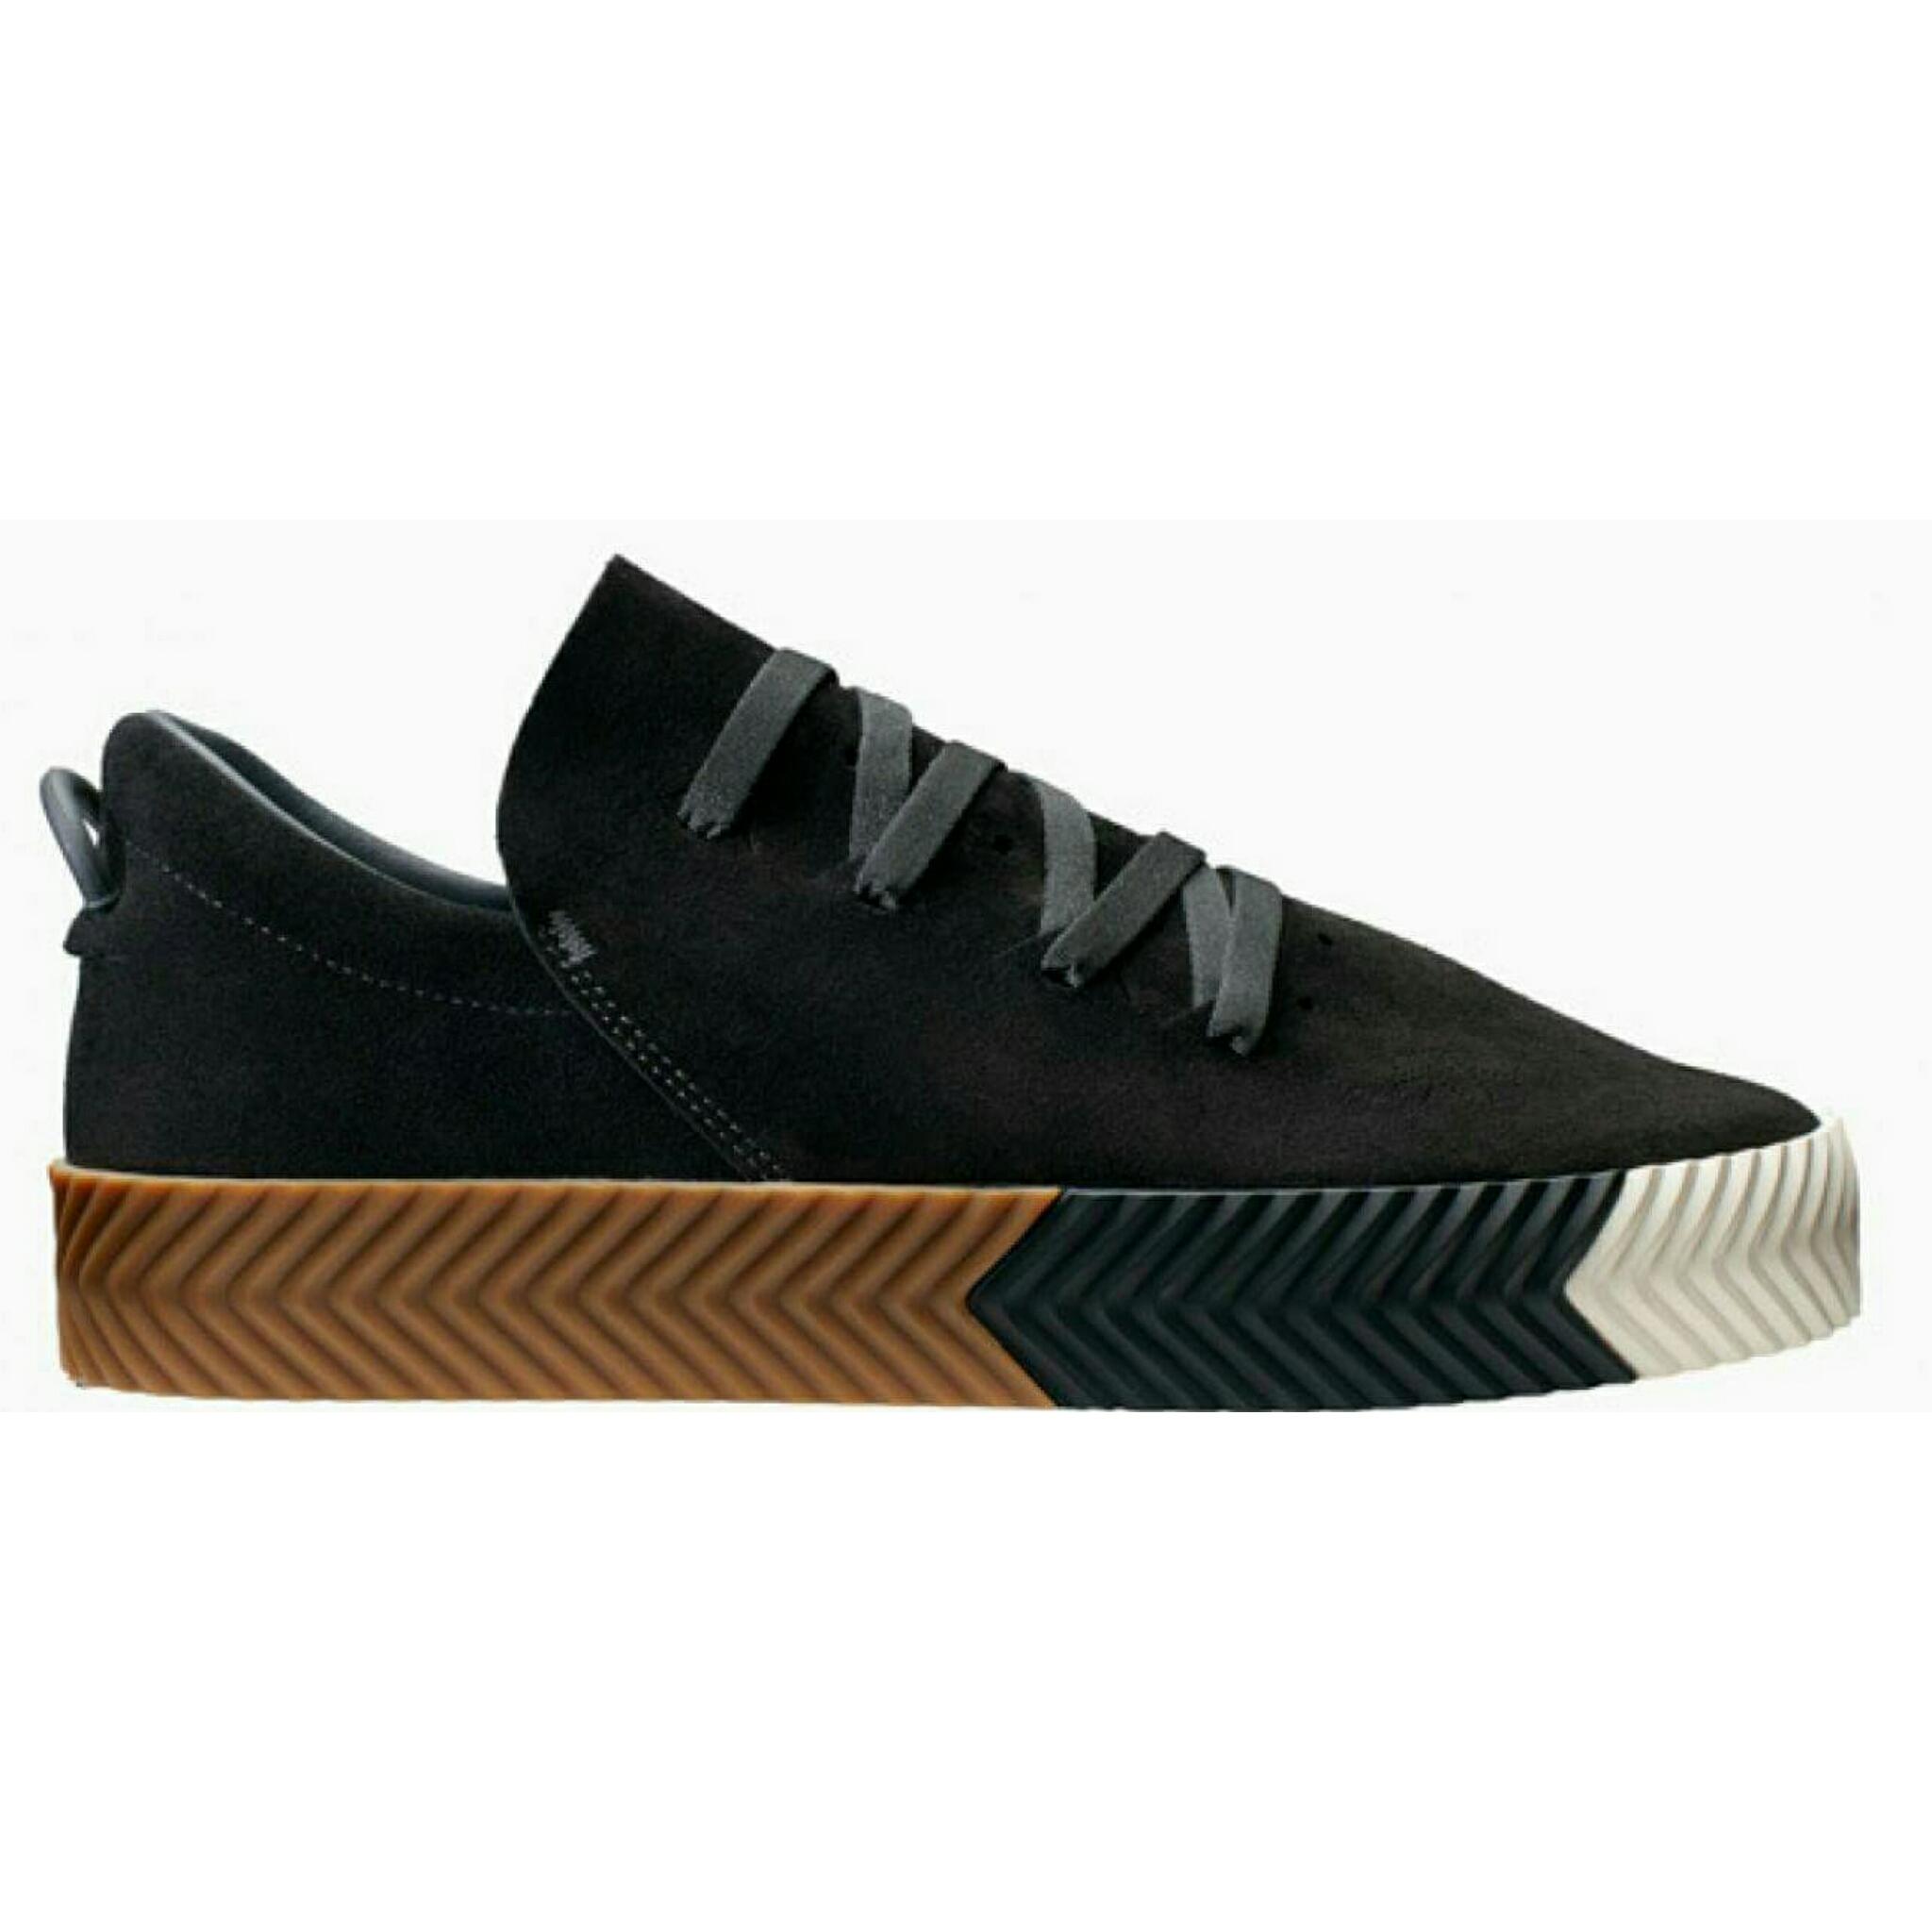 low priced 3fe8e 27a6a Adidas Alexander Wang